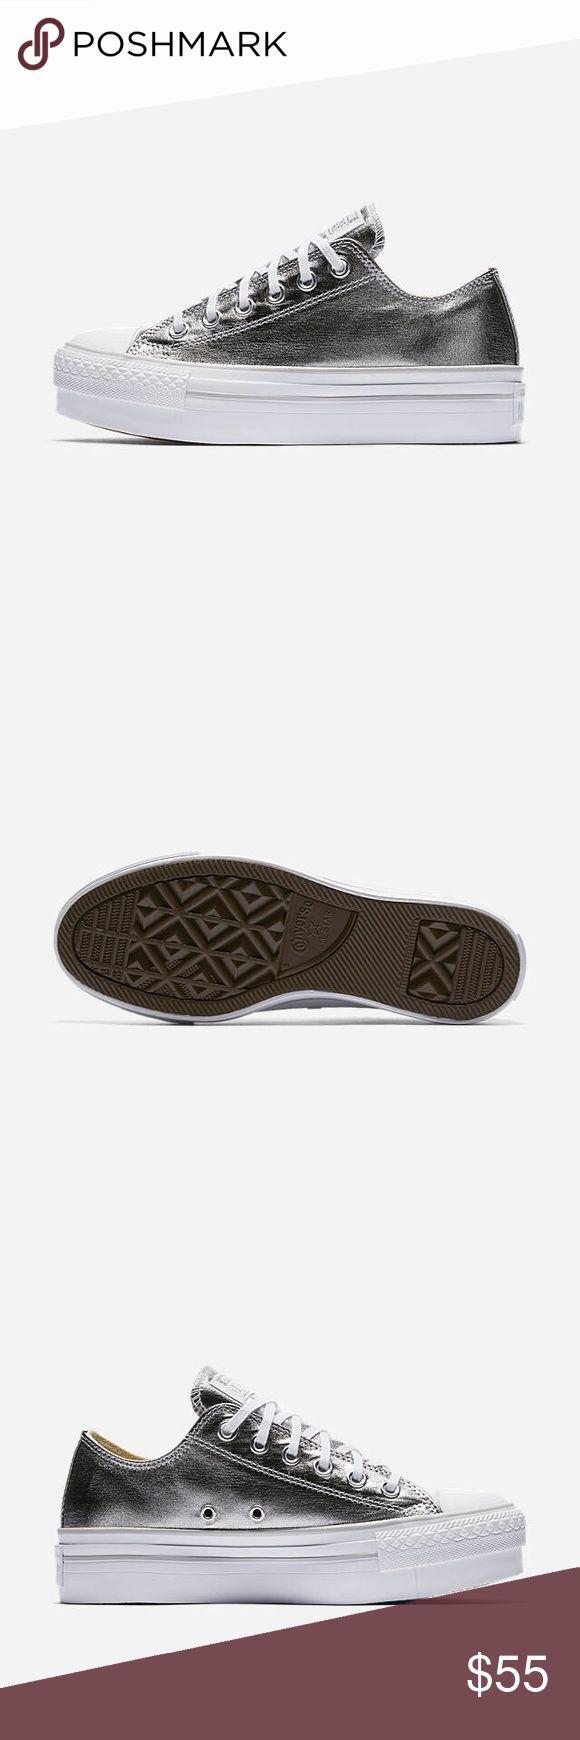 🌴☀️SALE! Converse platform metallic shoes WOMENS size 8 Converse Shoes Sneakers